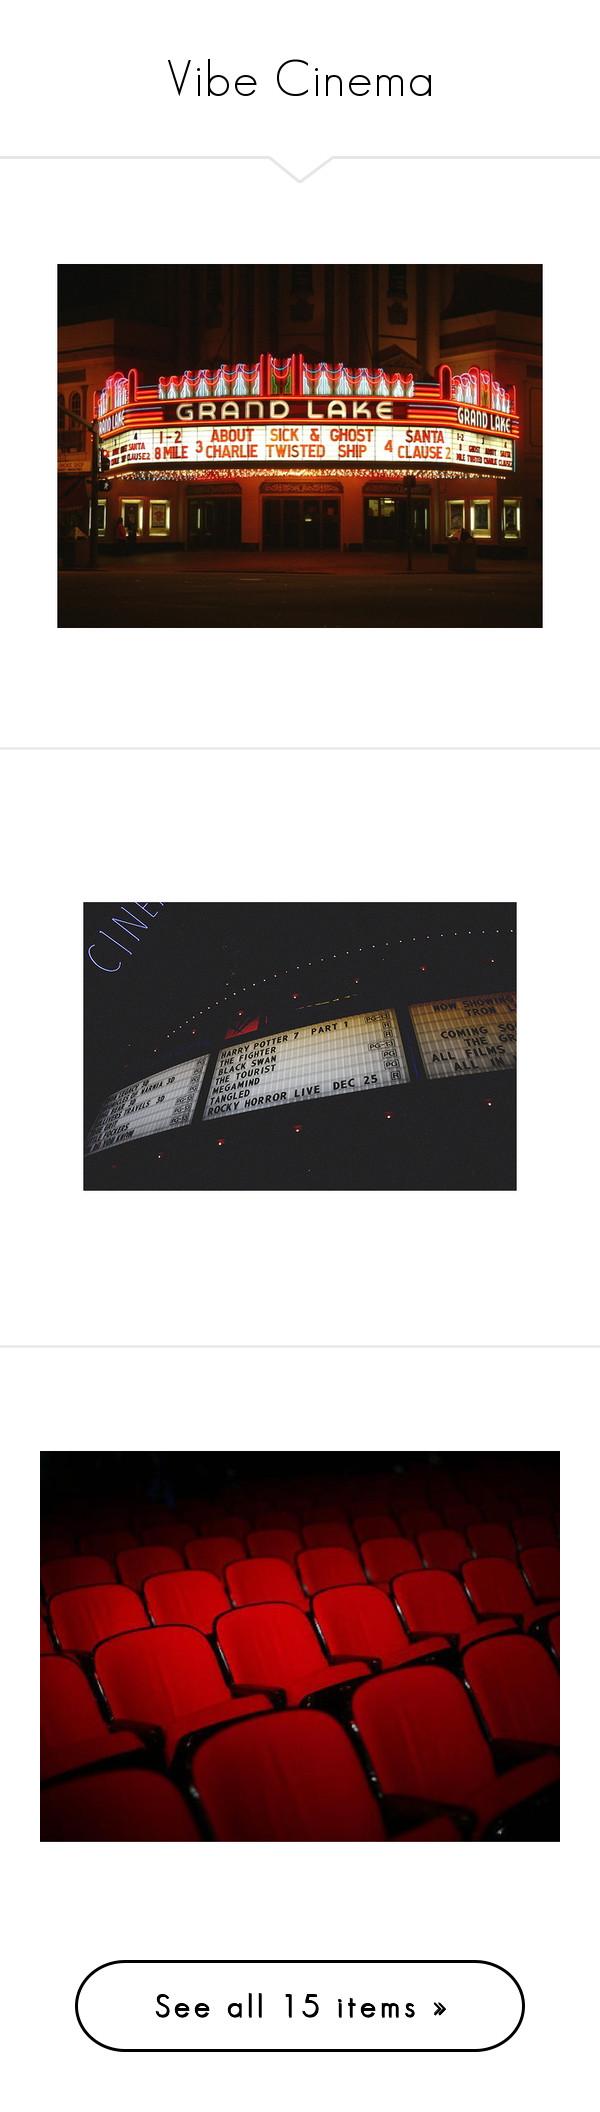 Vibe Cinema\